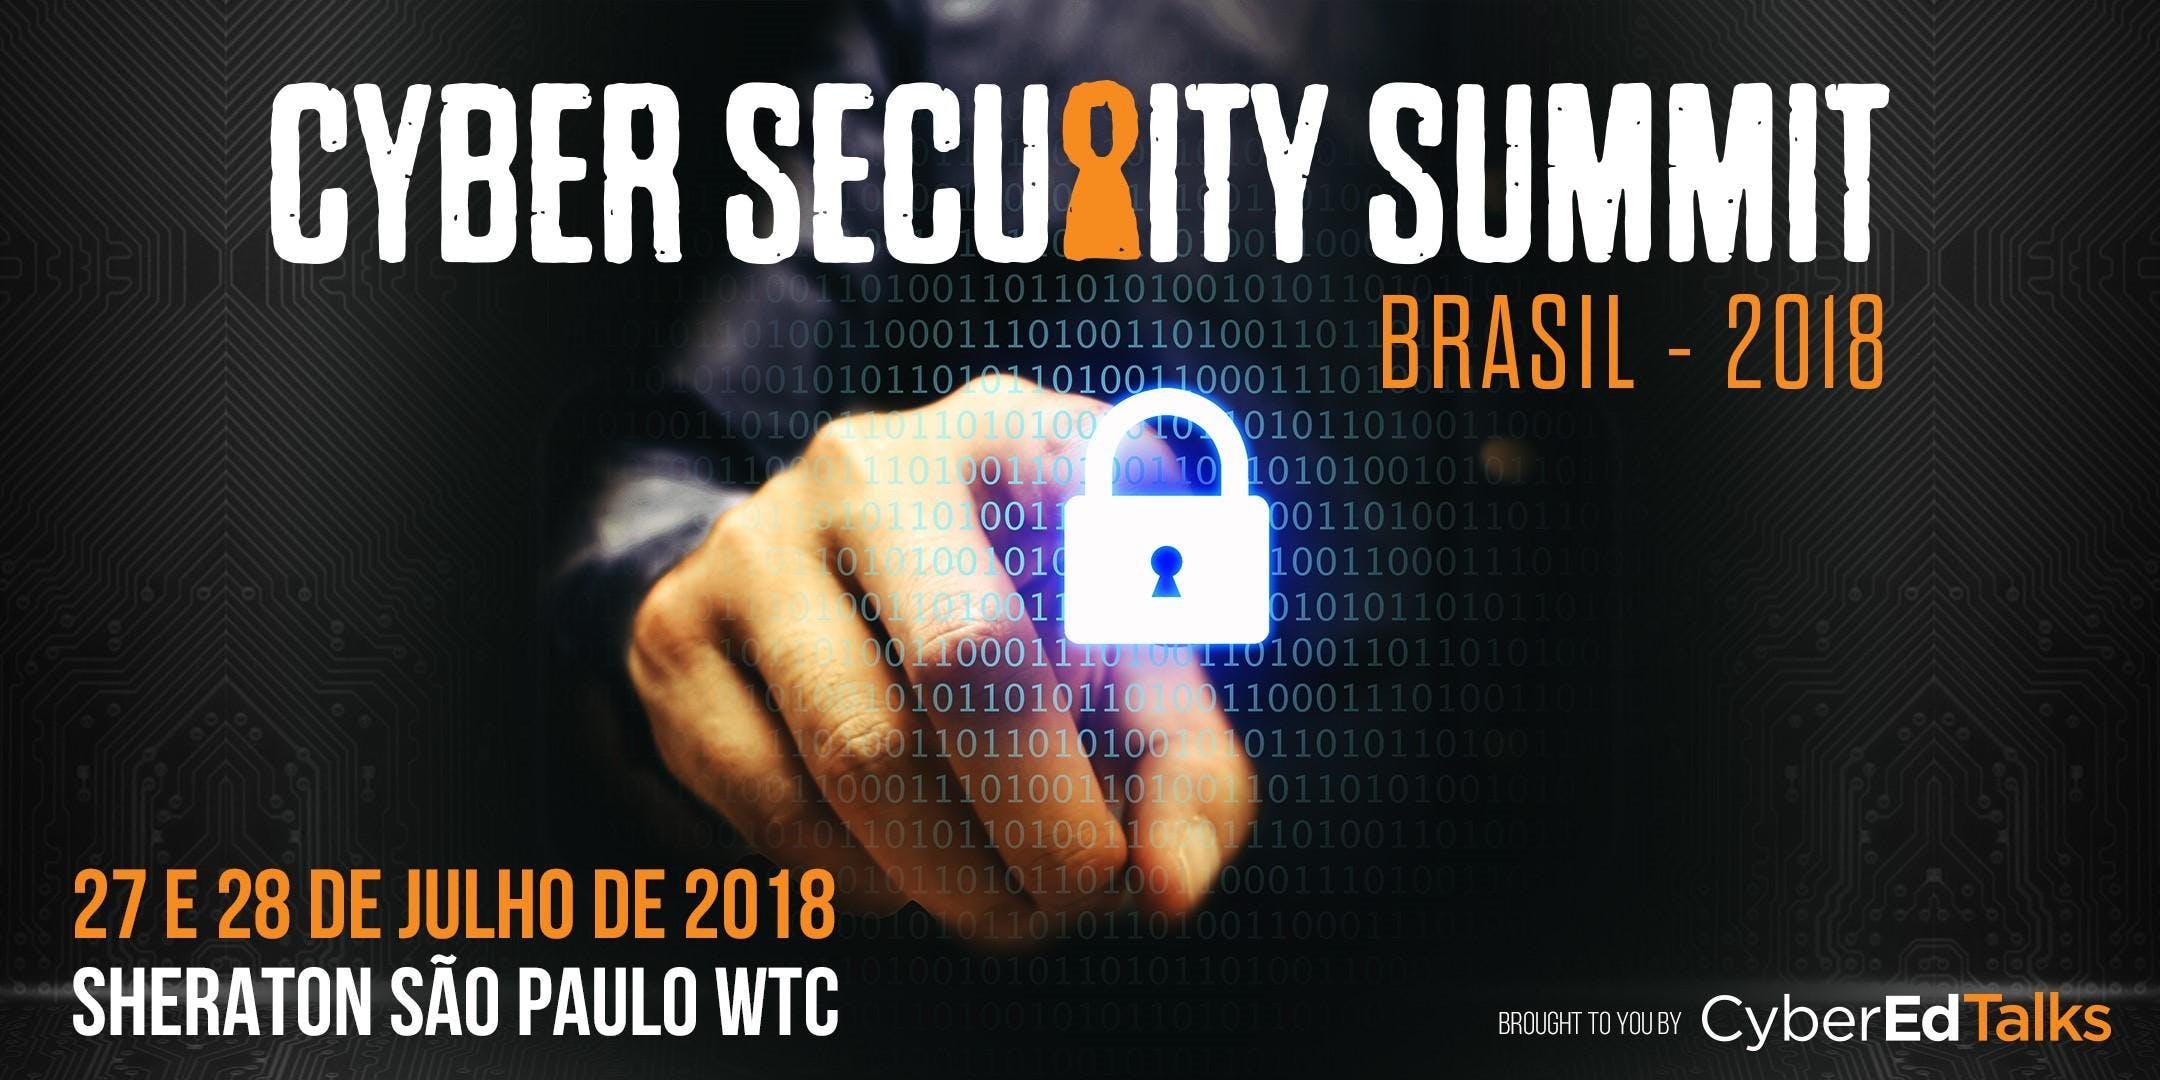 Cyber Security Summit Brasil 2018